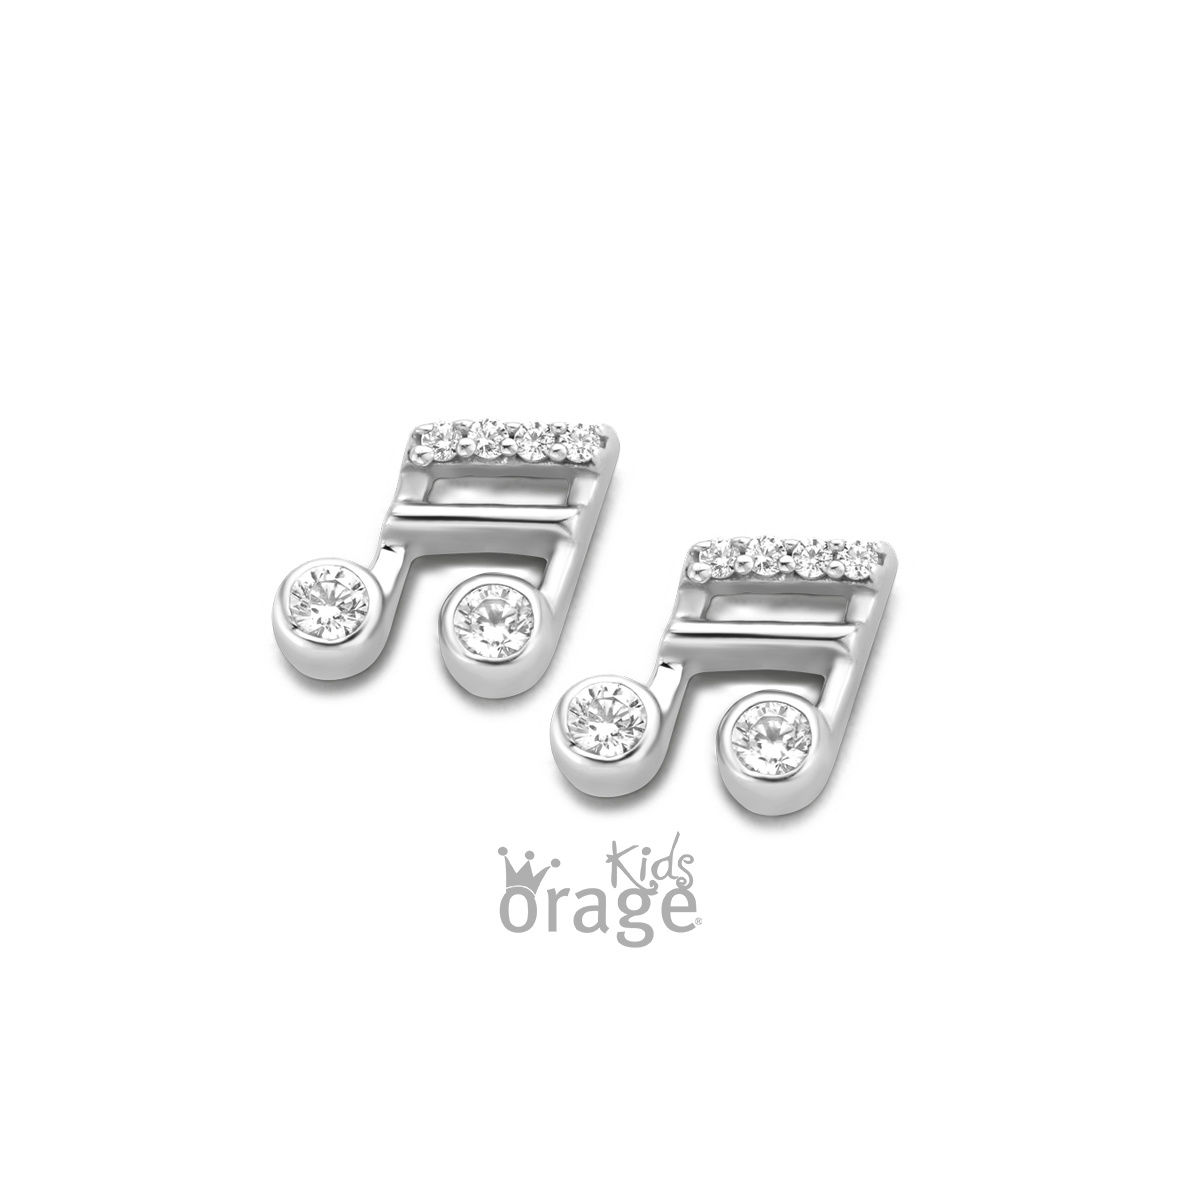 Orage kids Oorringen muzieknoot 925 rh cz